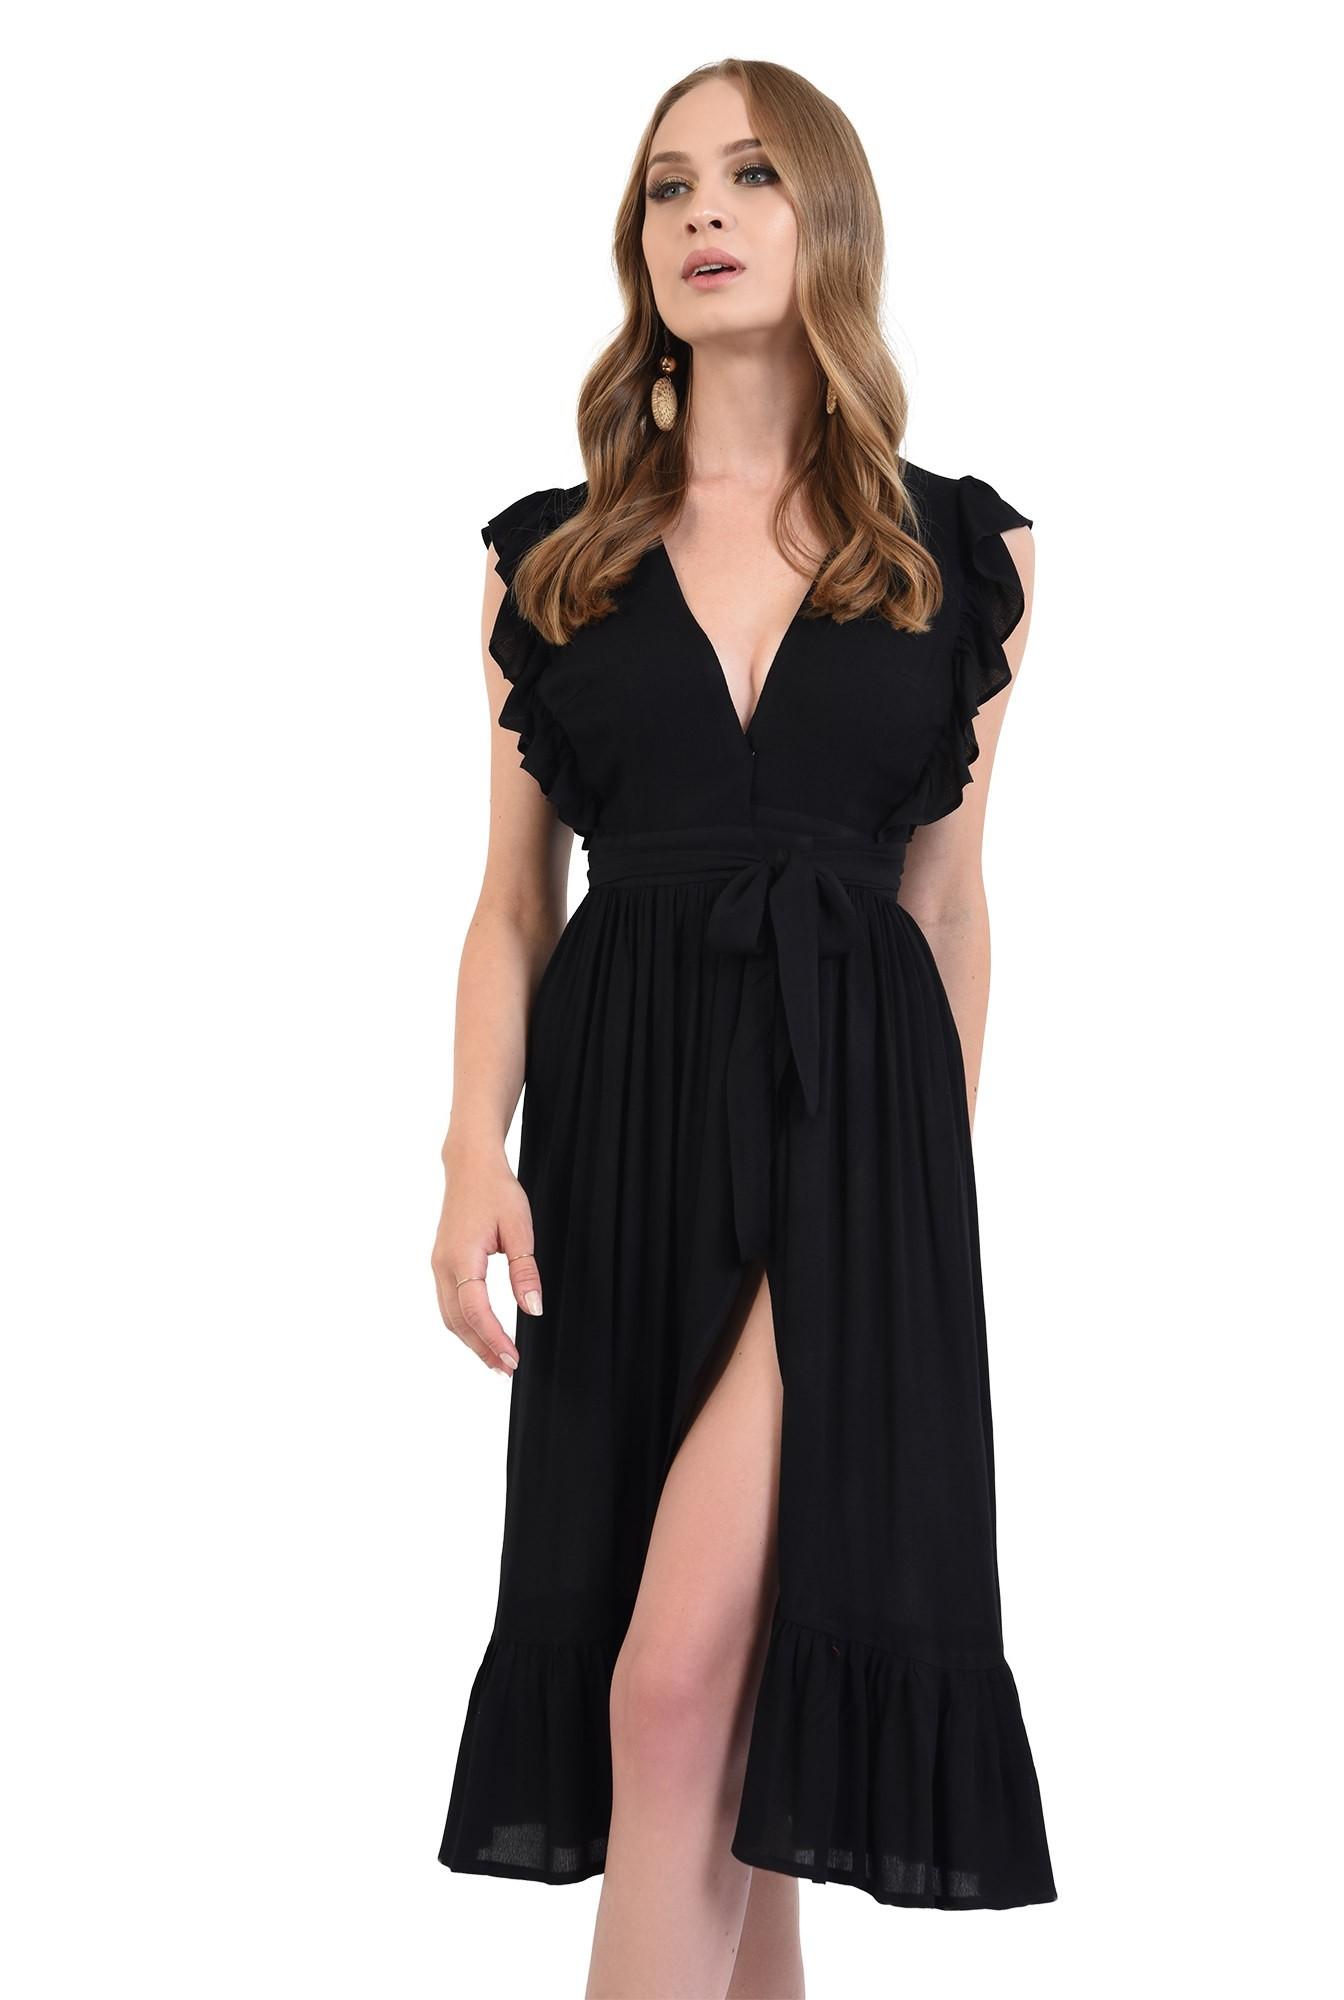 360 - rochie neagra, petrecuta, cu volan la umeri, Poema